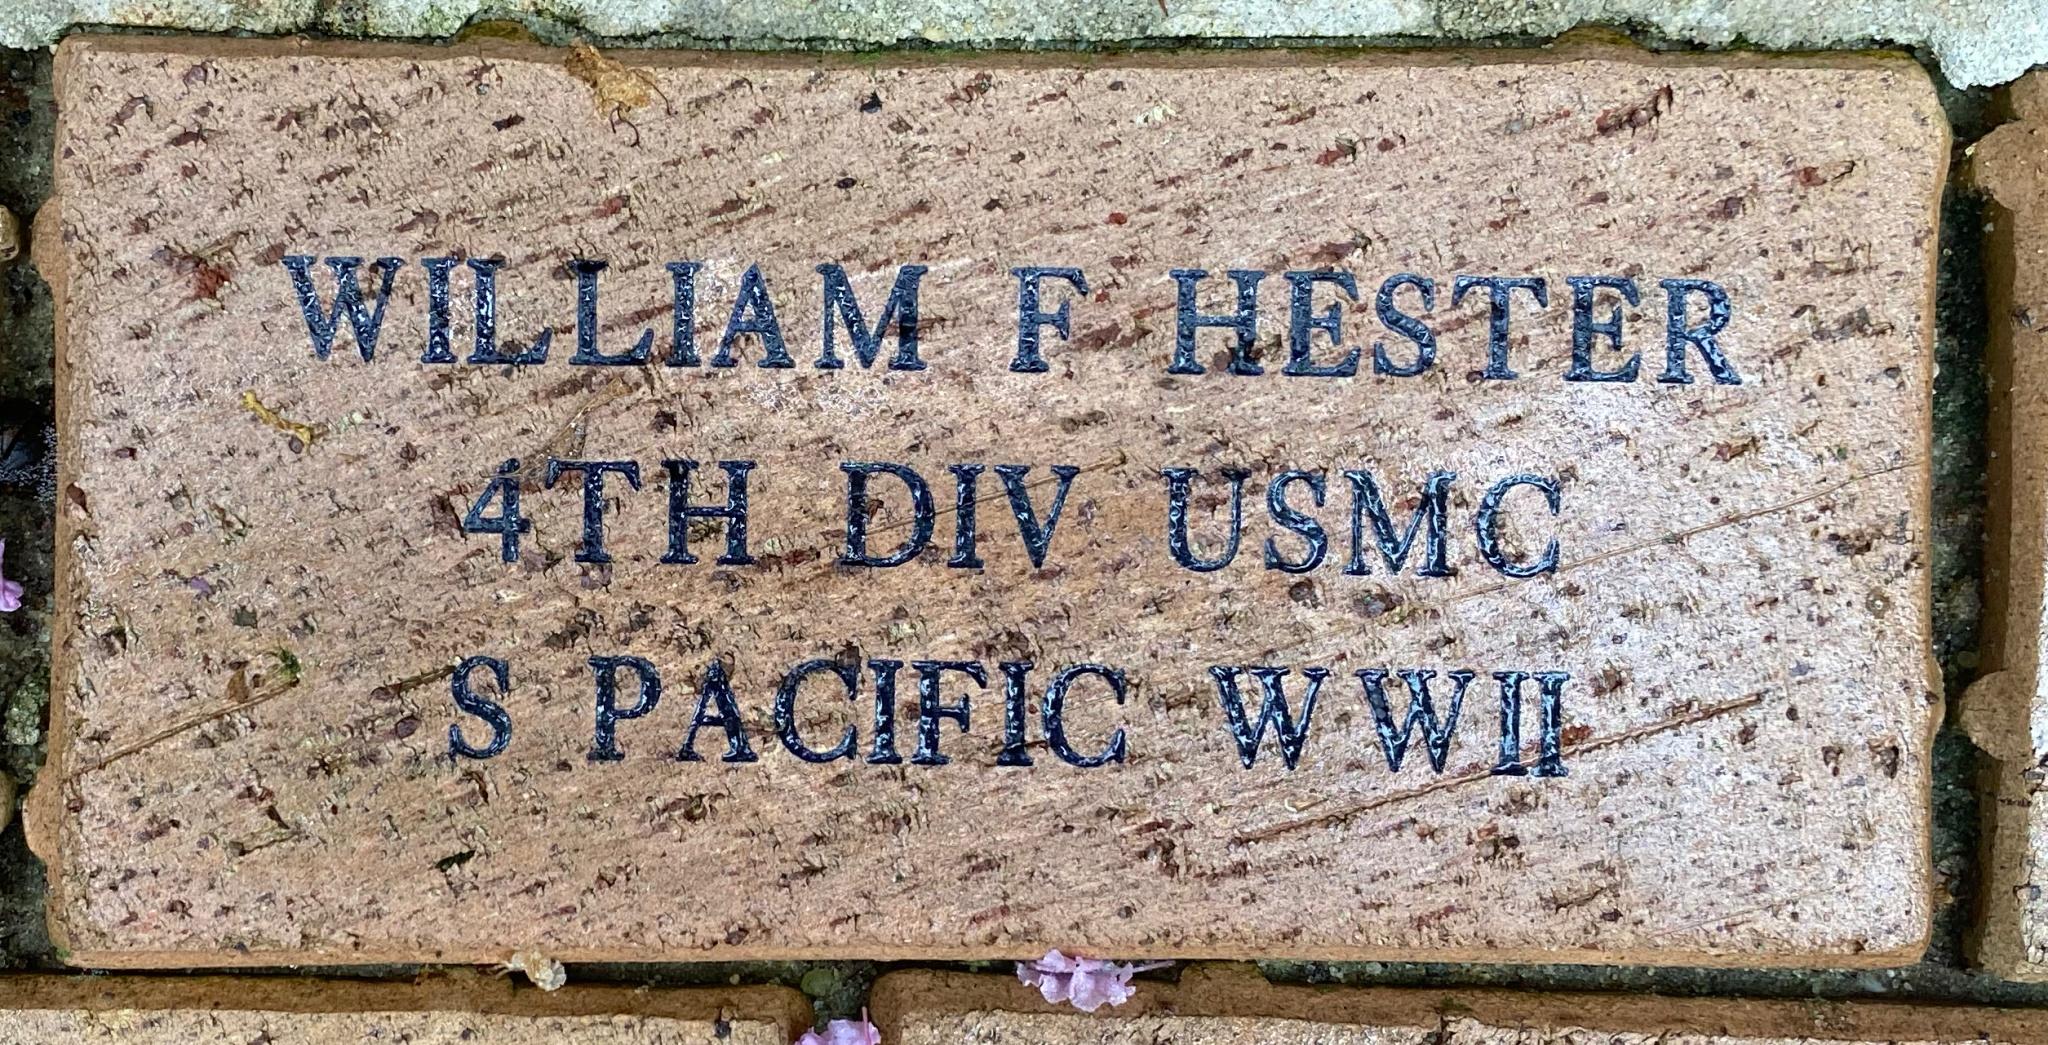 WILLIAM F HESTER 4TH DIV USMC S PACIFIC WWII